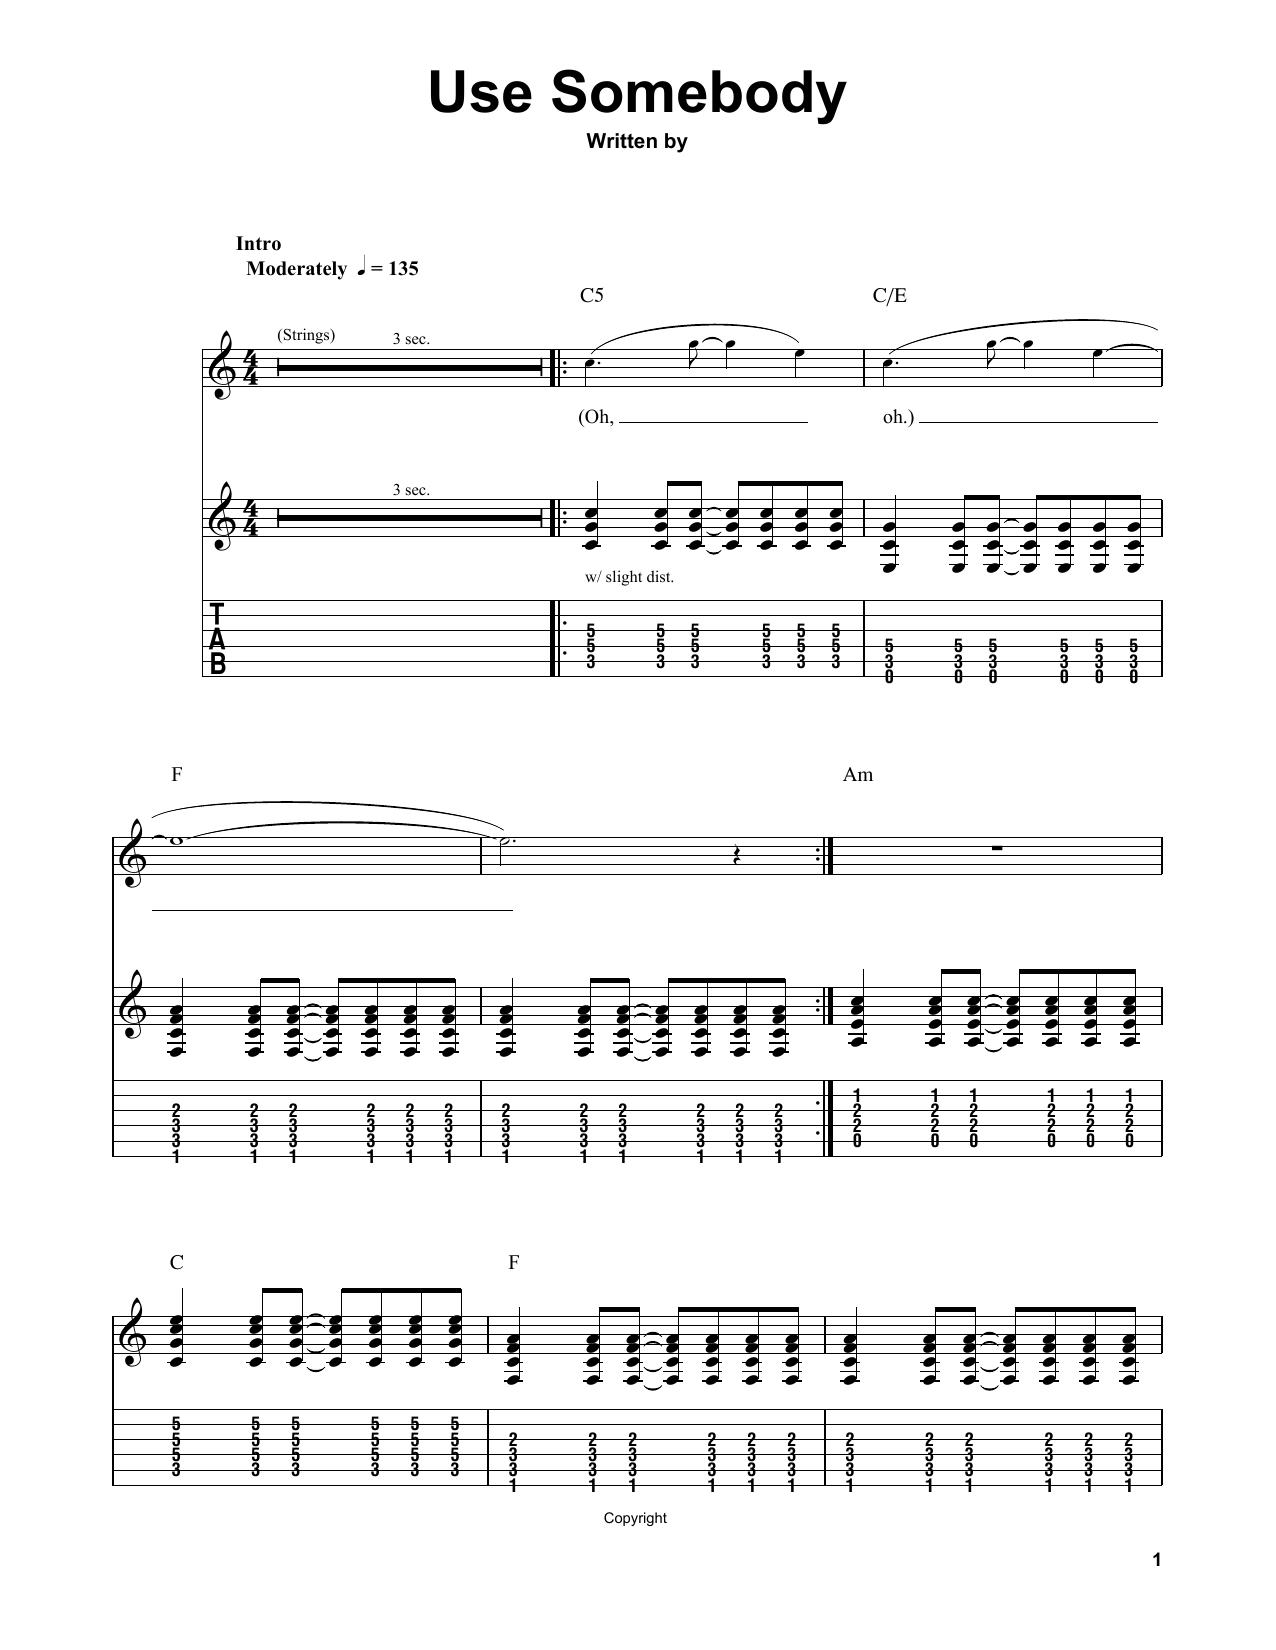 Use Somebody Sheet Music